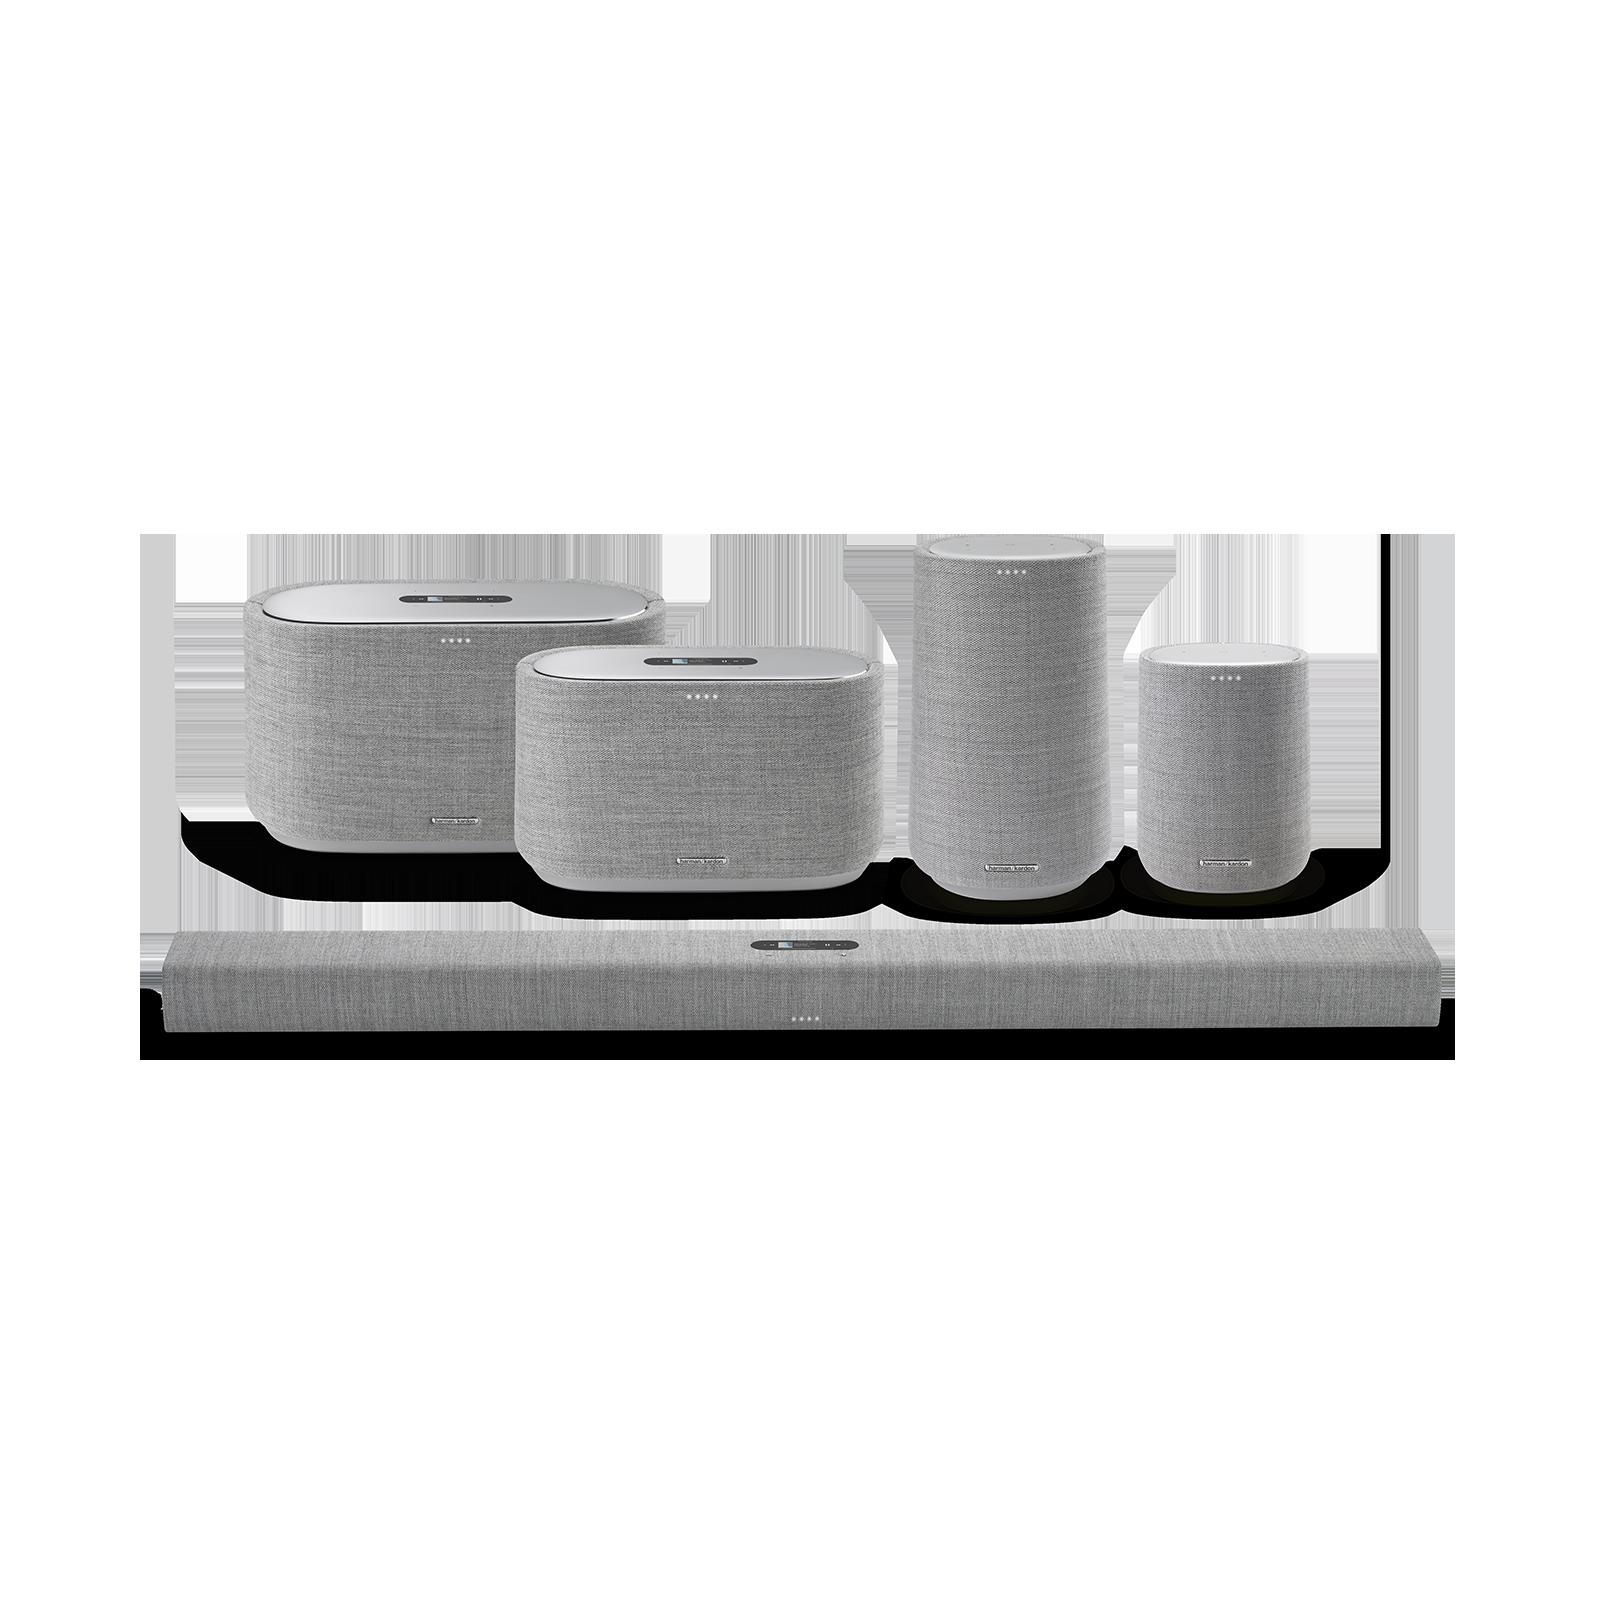 Harman Kardon Citation ONE - Grey - Compact, smart and amazing sound - Detailshot 5